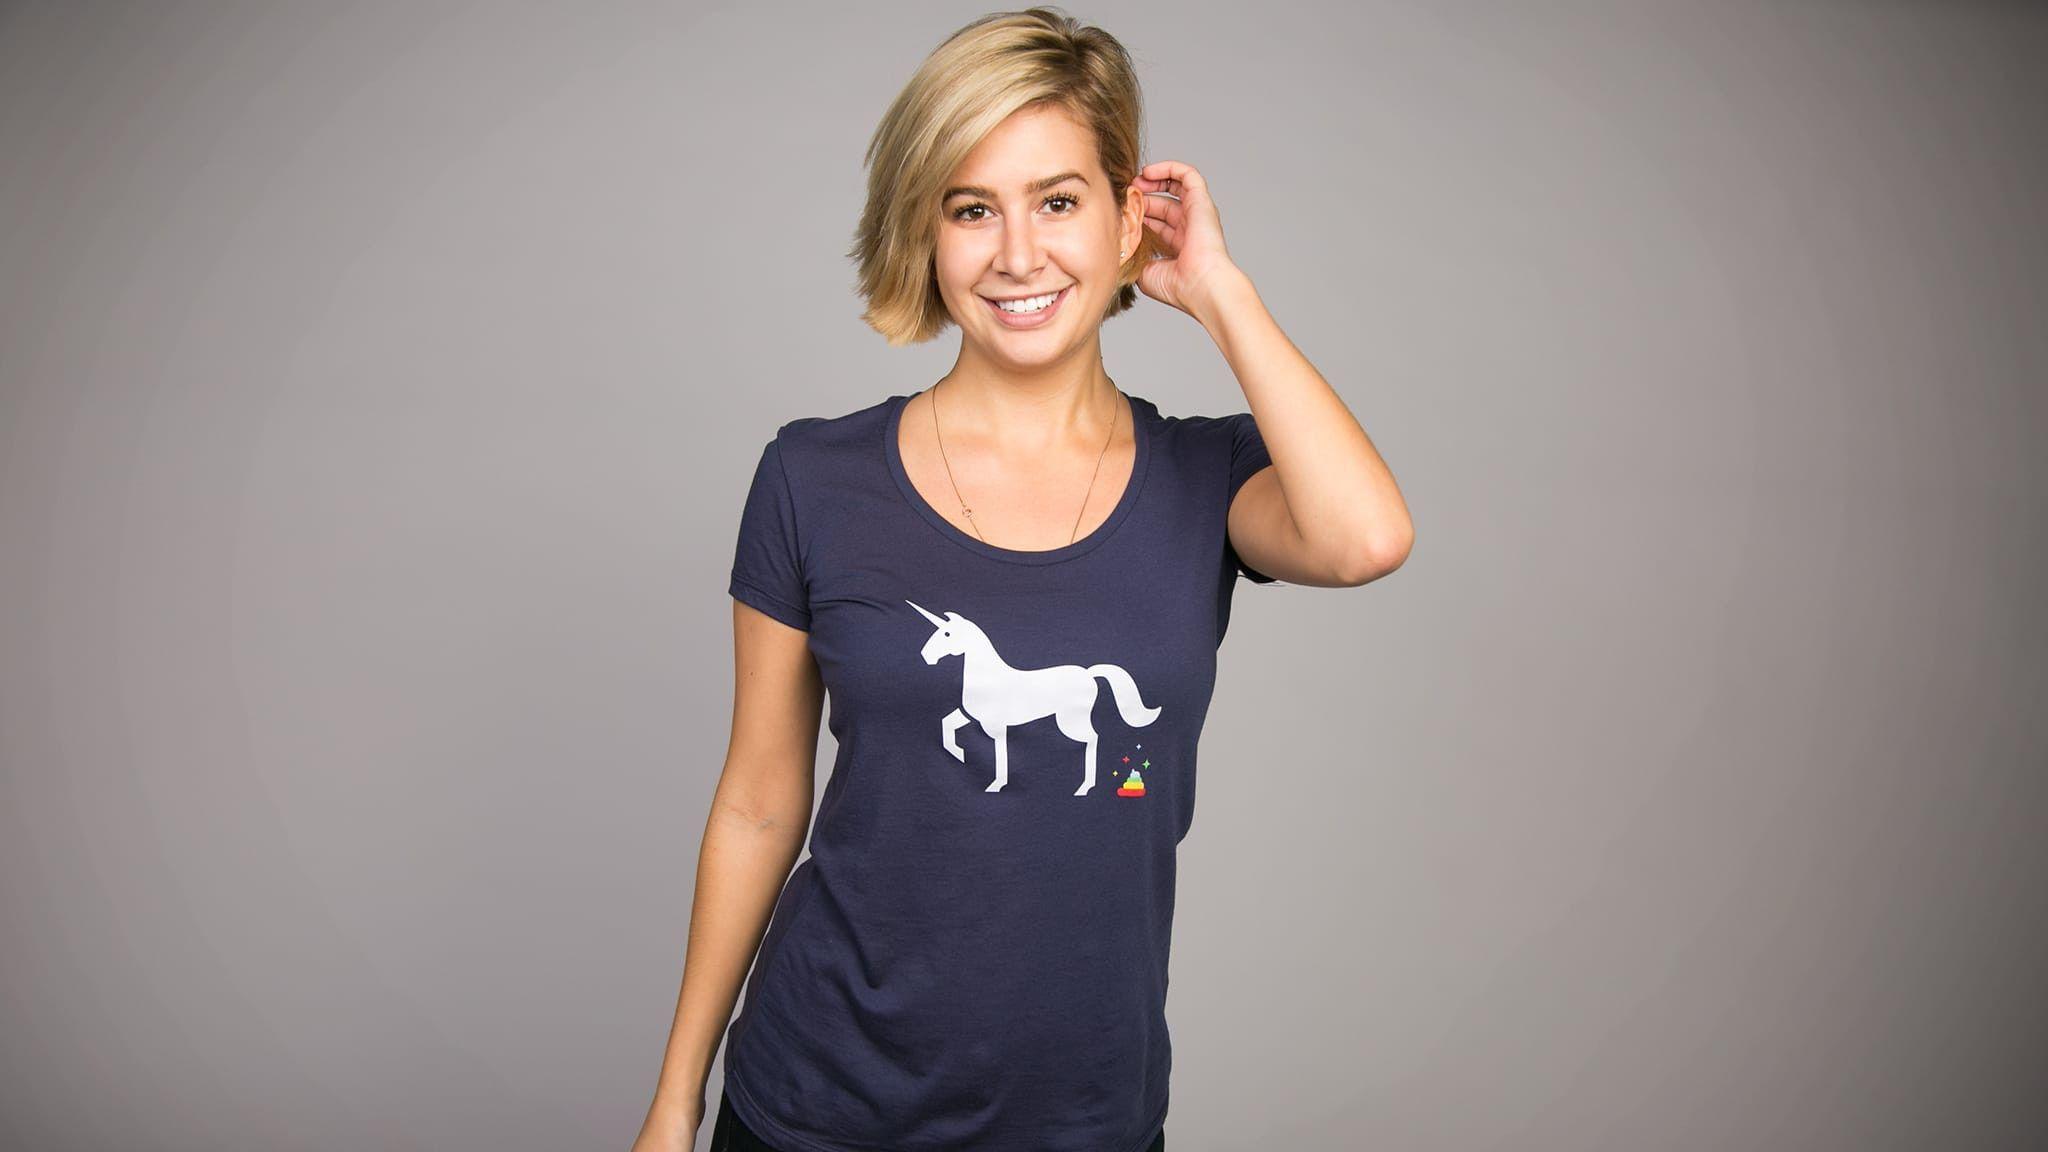 Smell the Rainbow T-Shirt